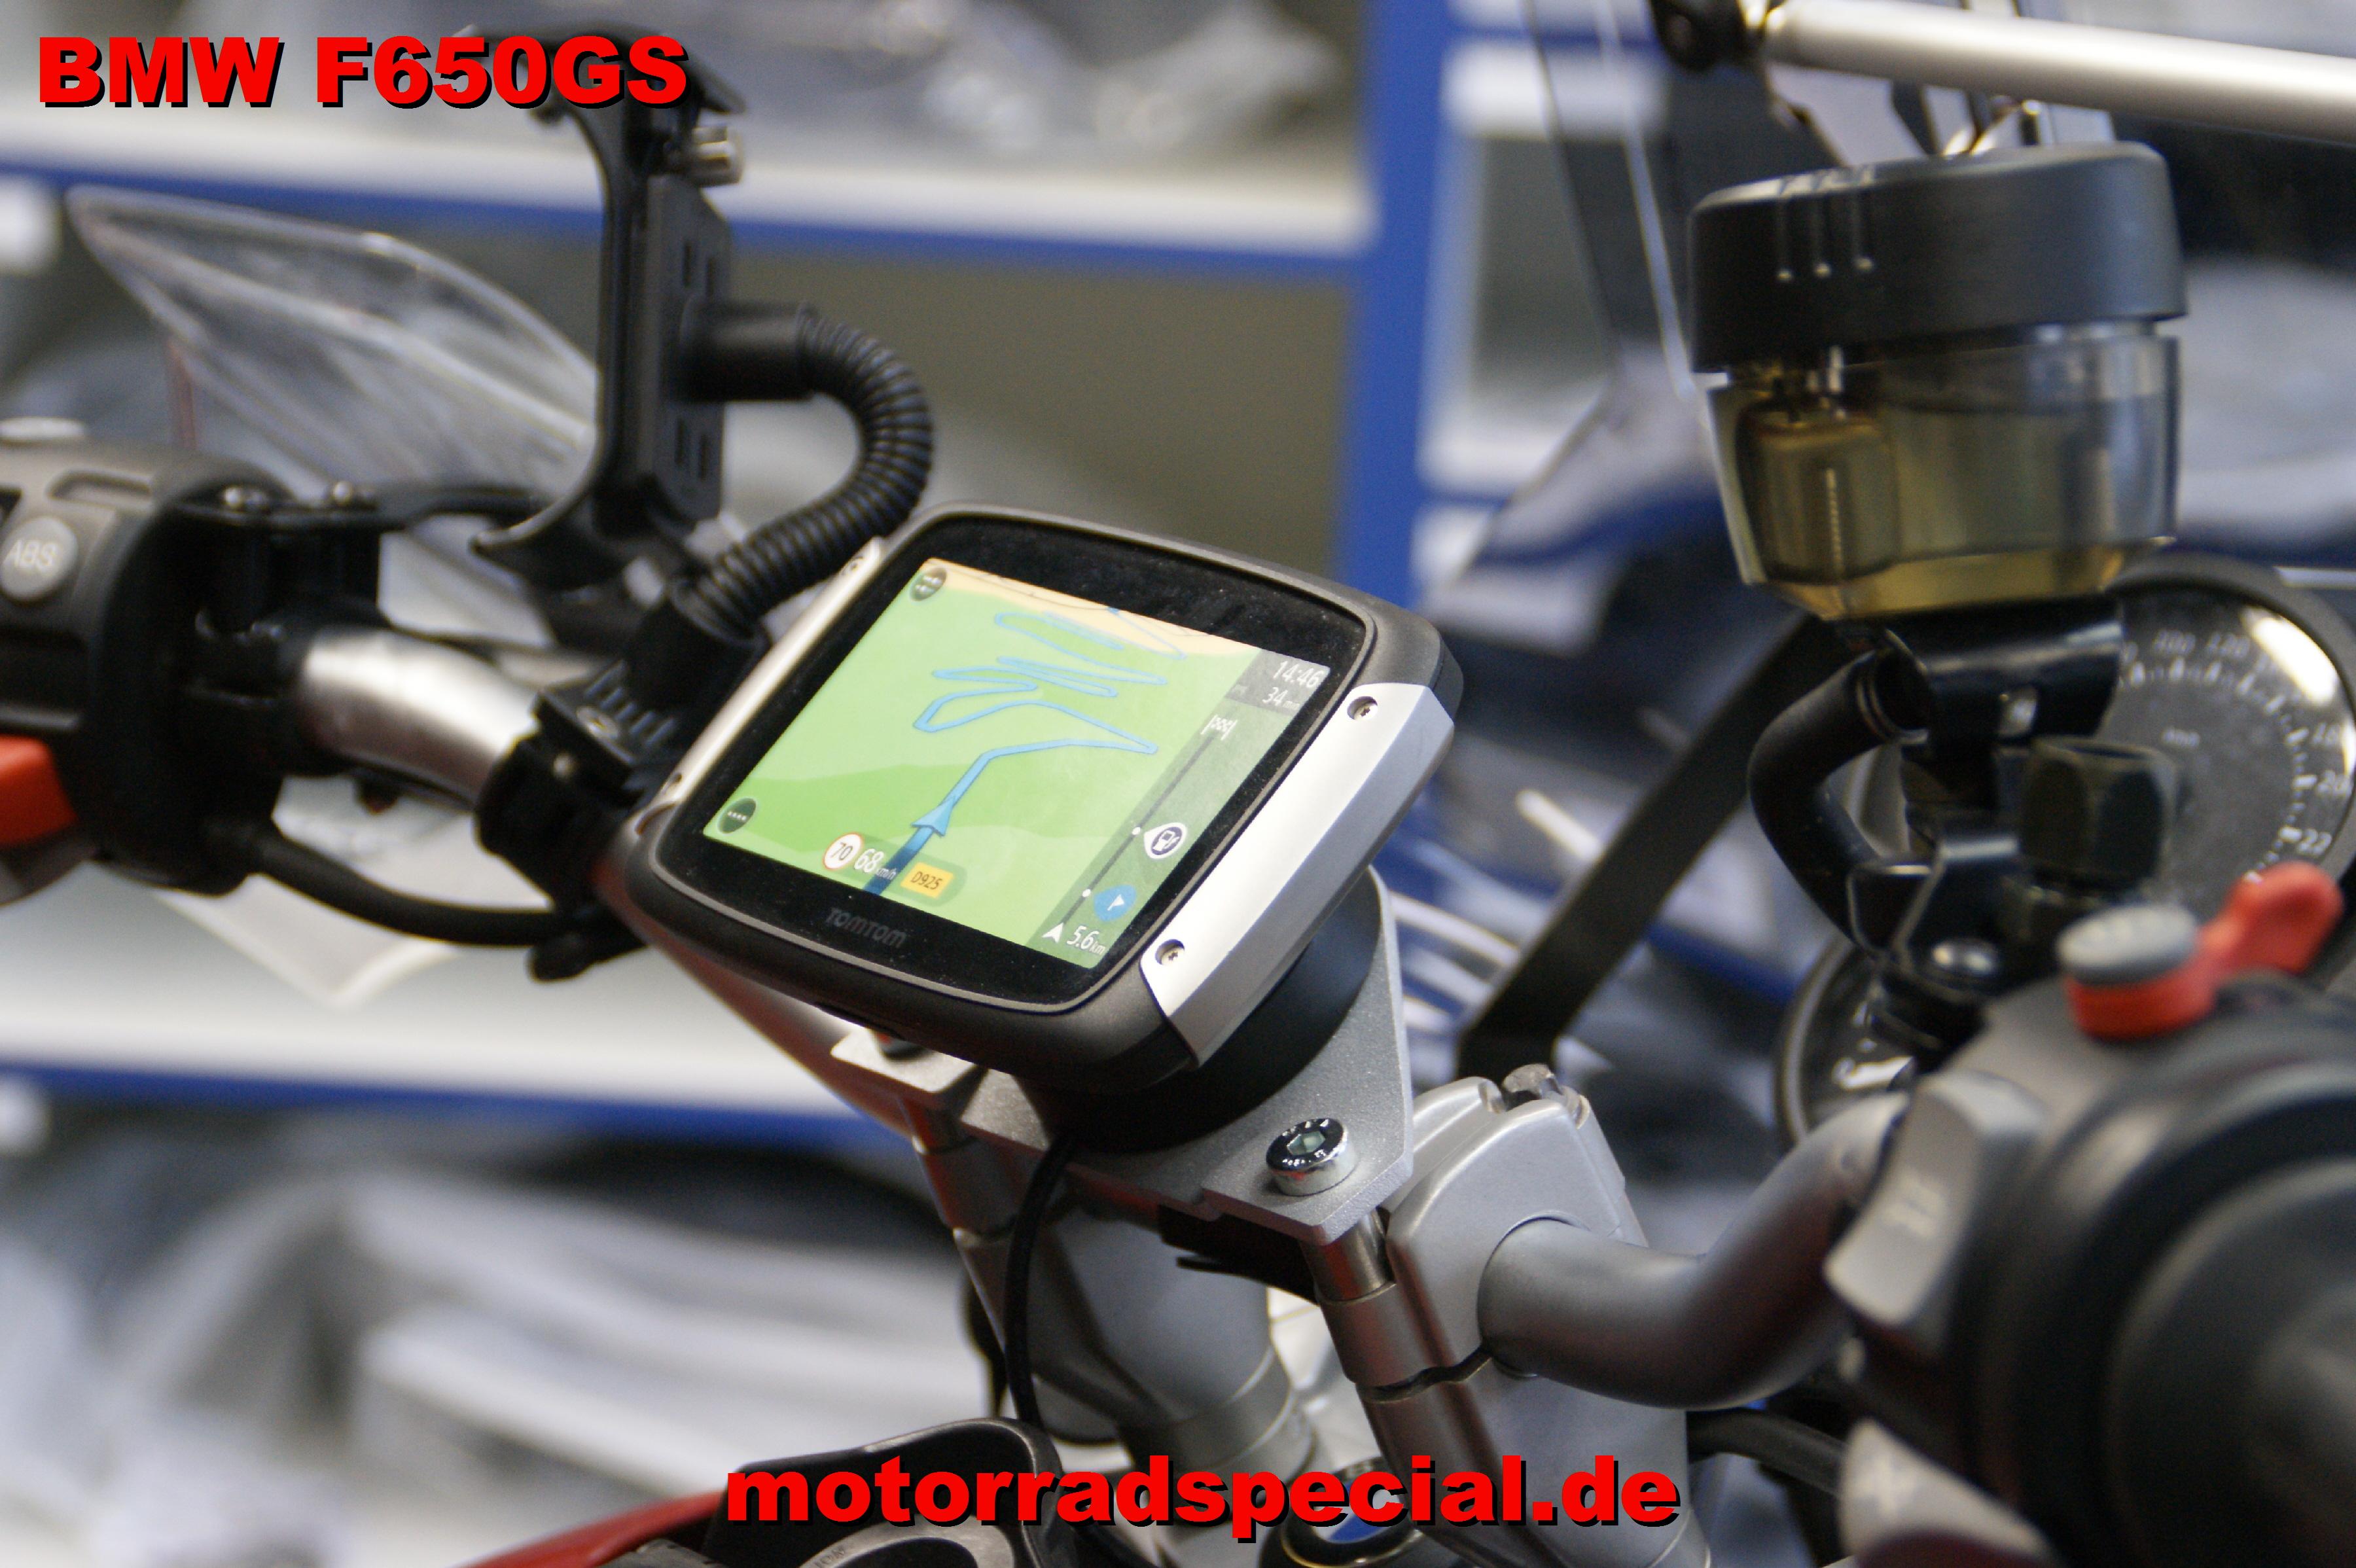 BMW_F650GS_Navigationshalterung_Navigationshalter_TomTom Rider_400_410_5